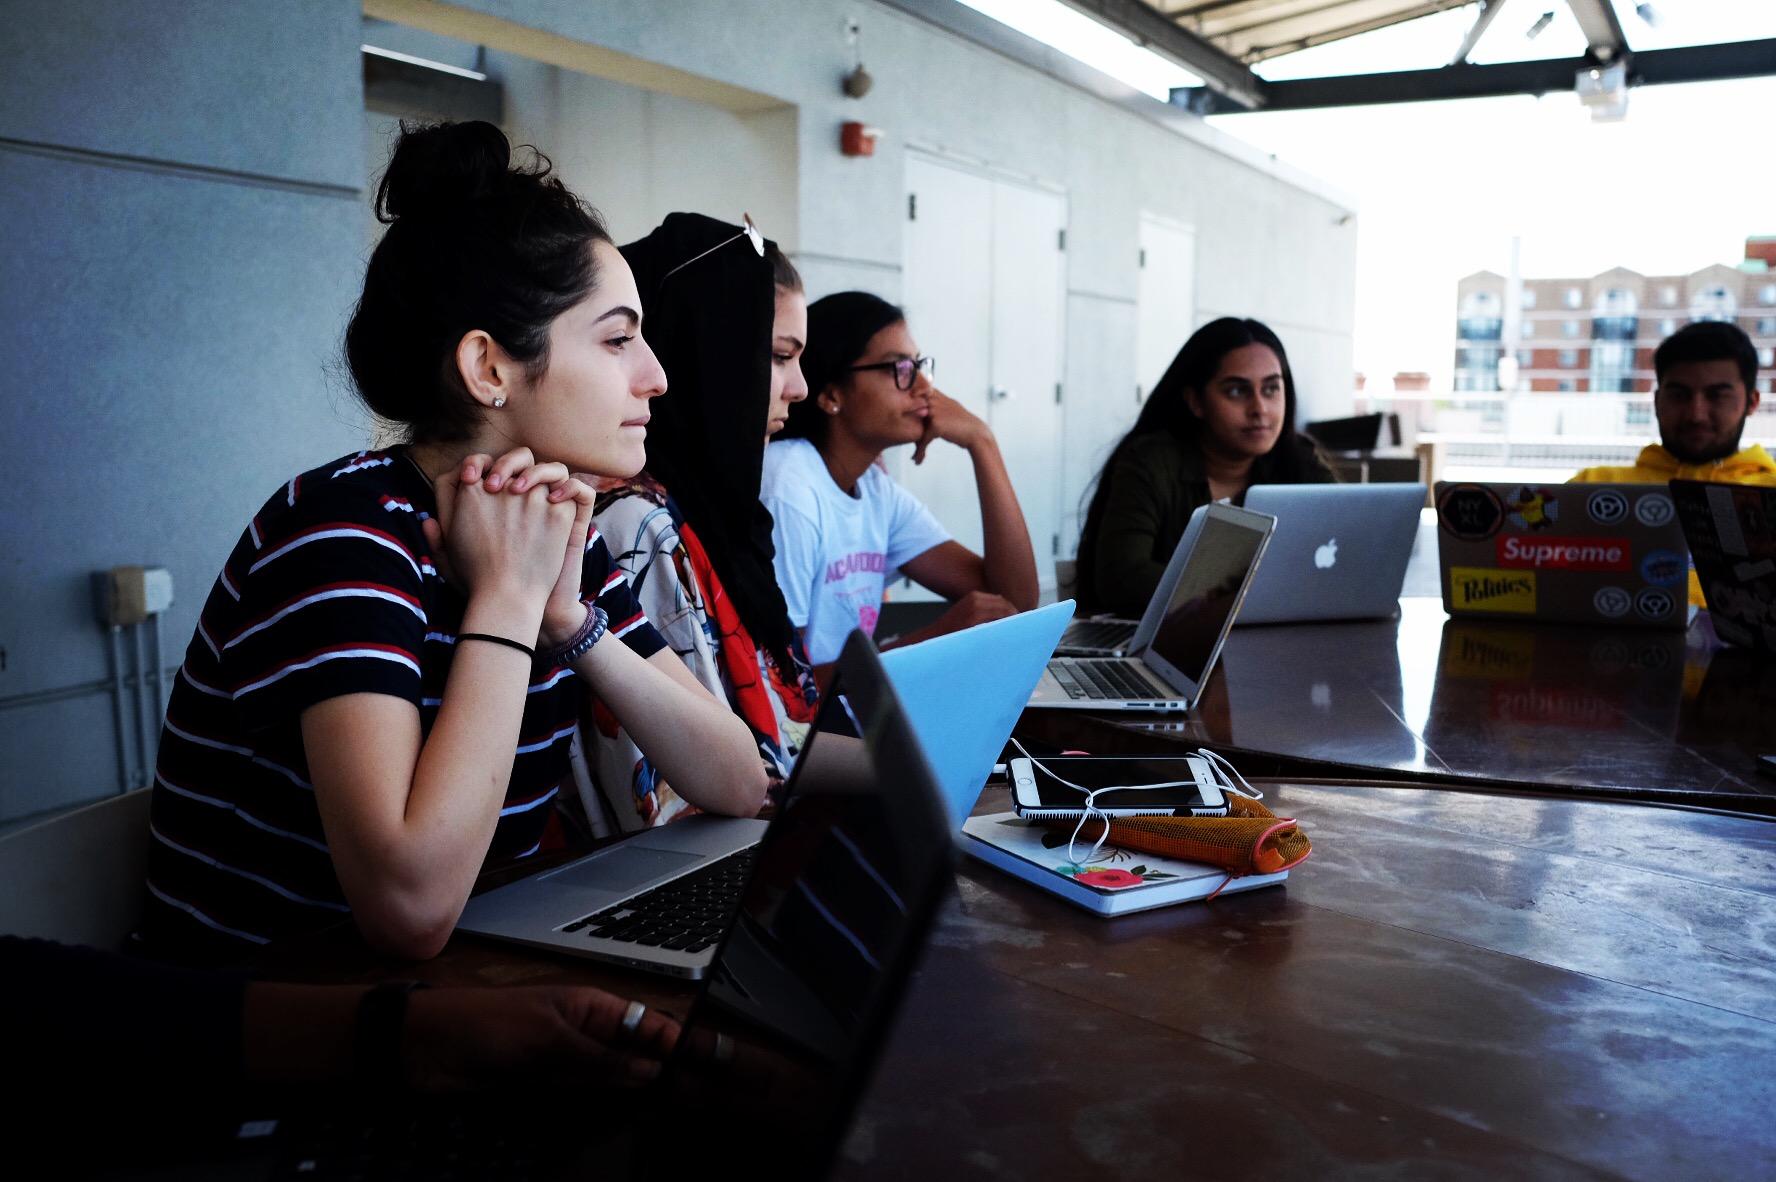 Next Wave Muslim Initiative (NWMI) writers Noor, Samaa, Leyla, Imaan, and Bilal in summer writing workshop.